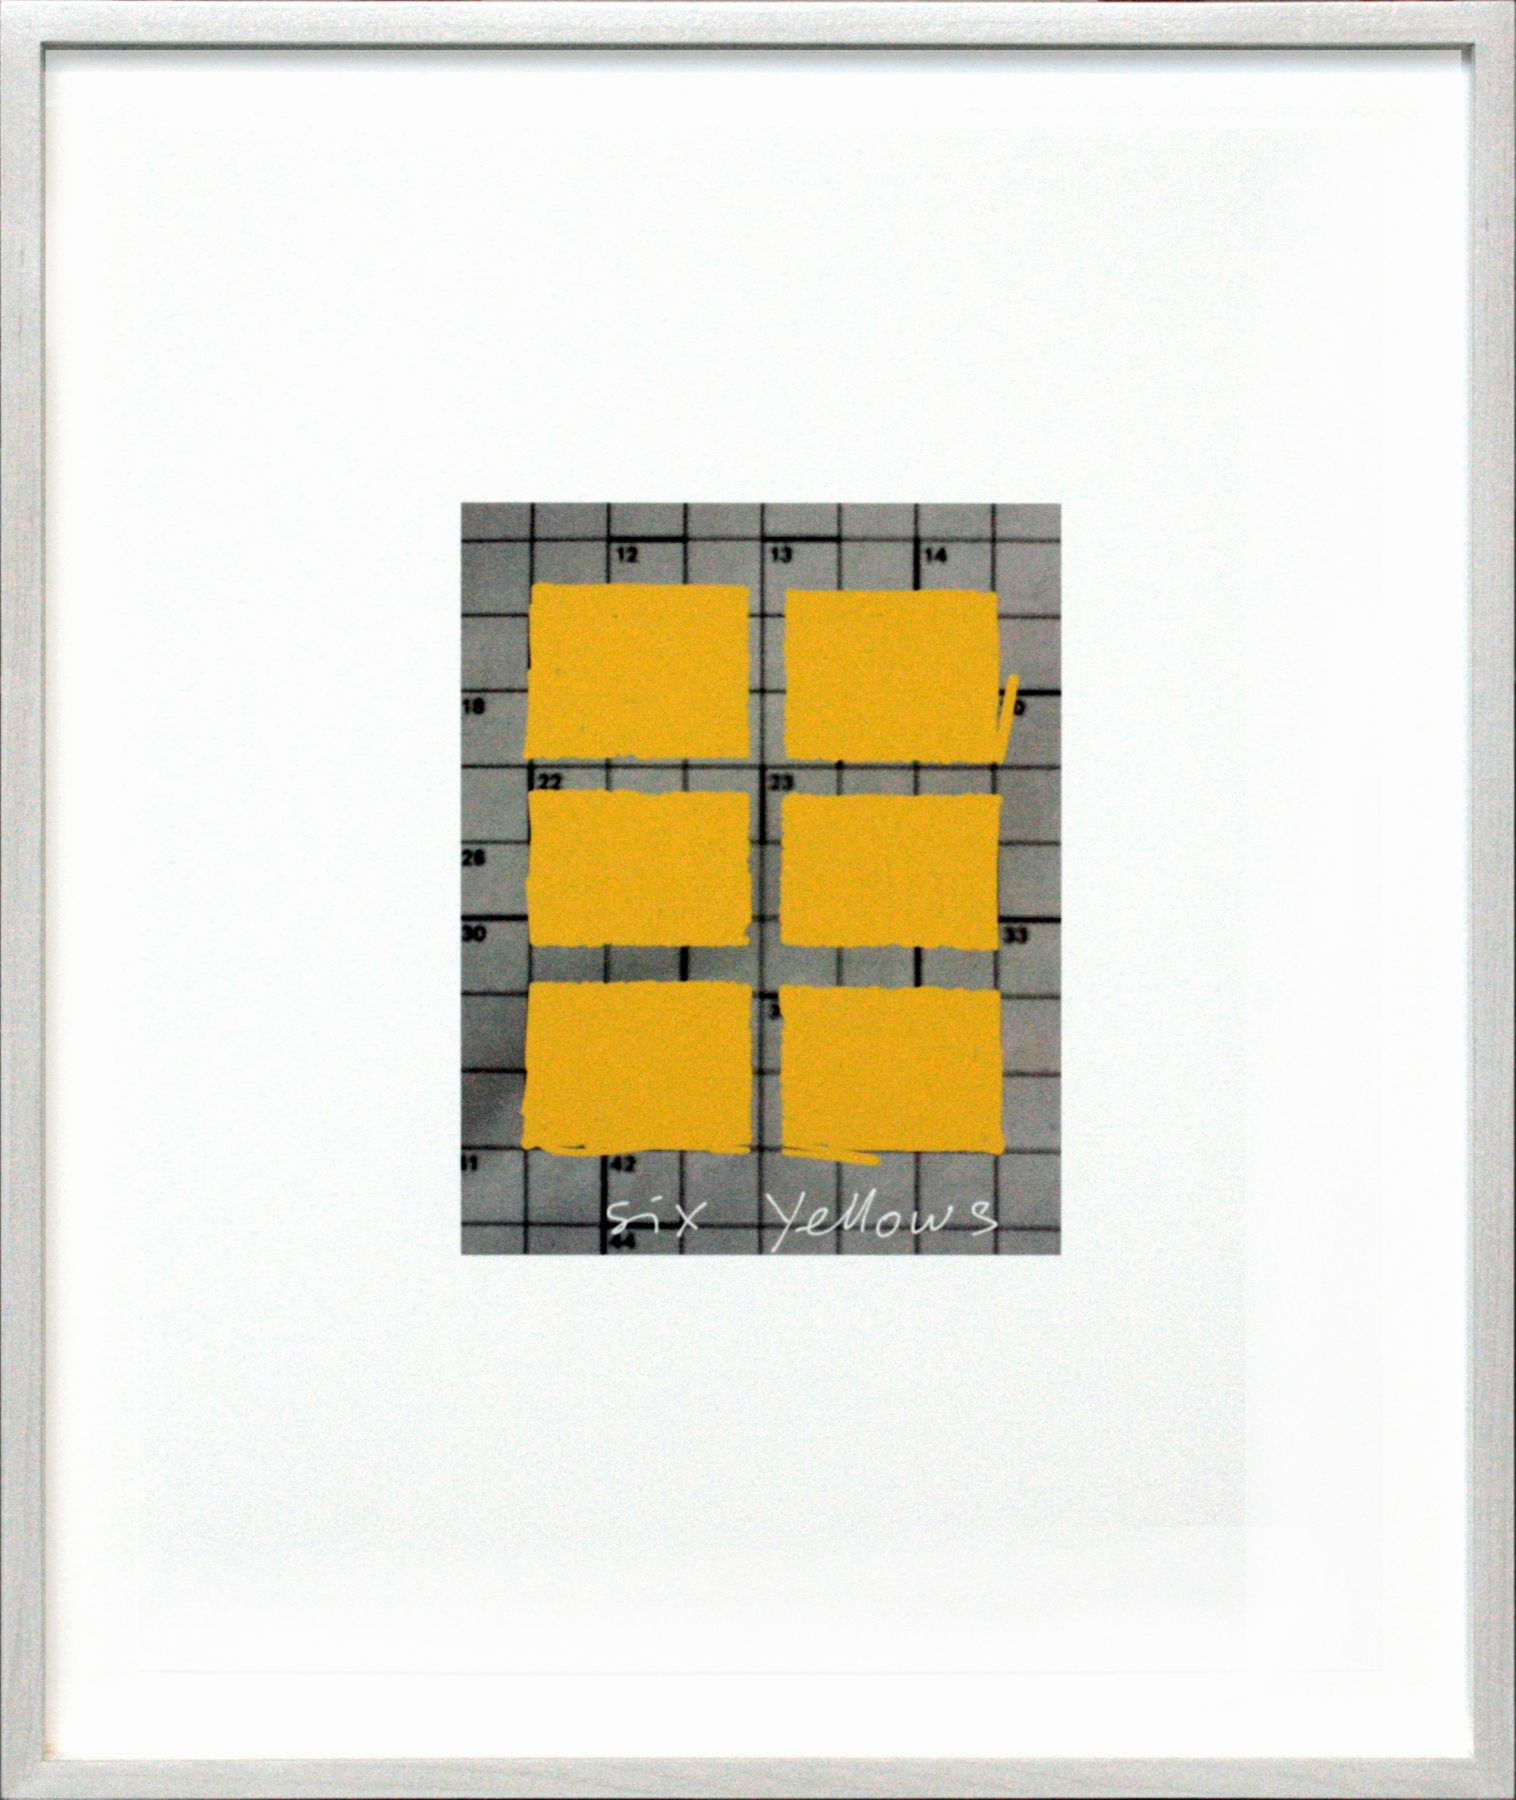 Pen, Six Yellows, 2013